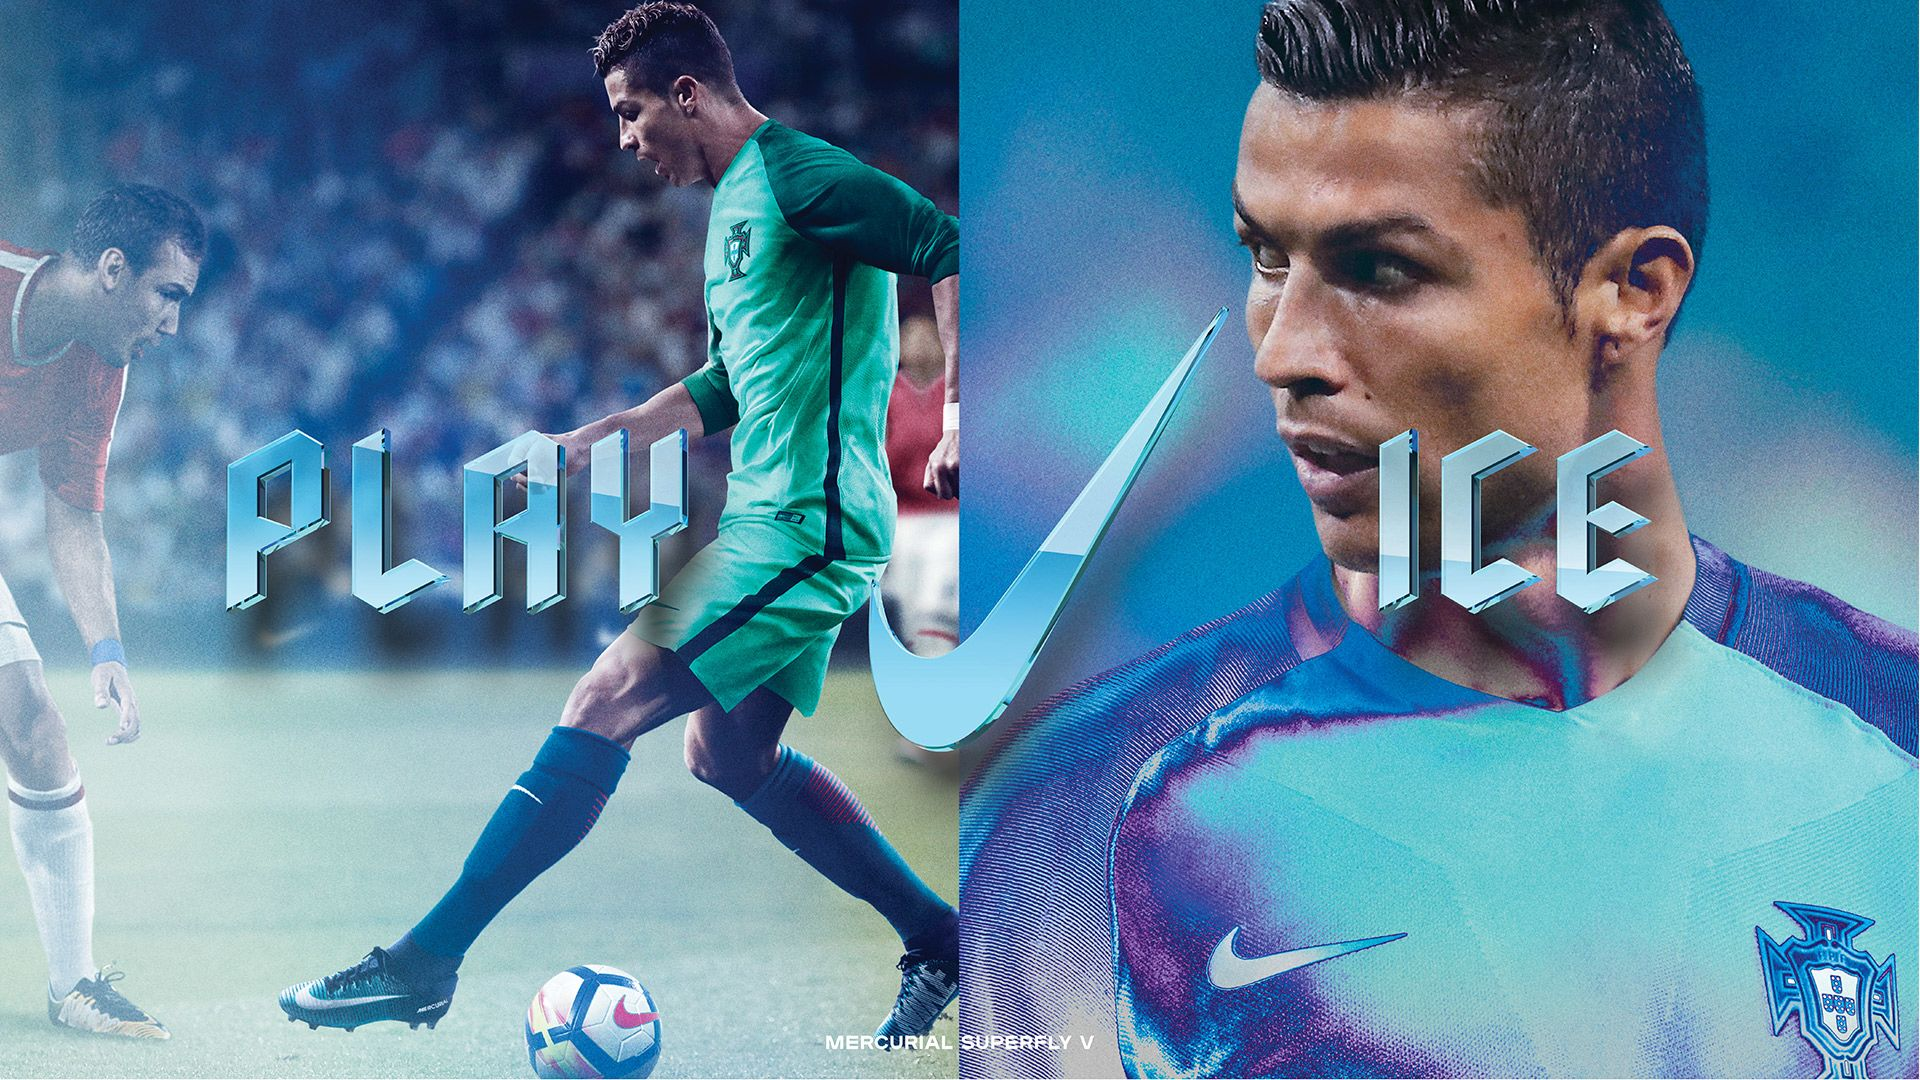 Nike Play Ice Mercurial Superfly 5